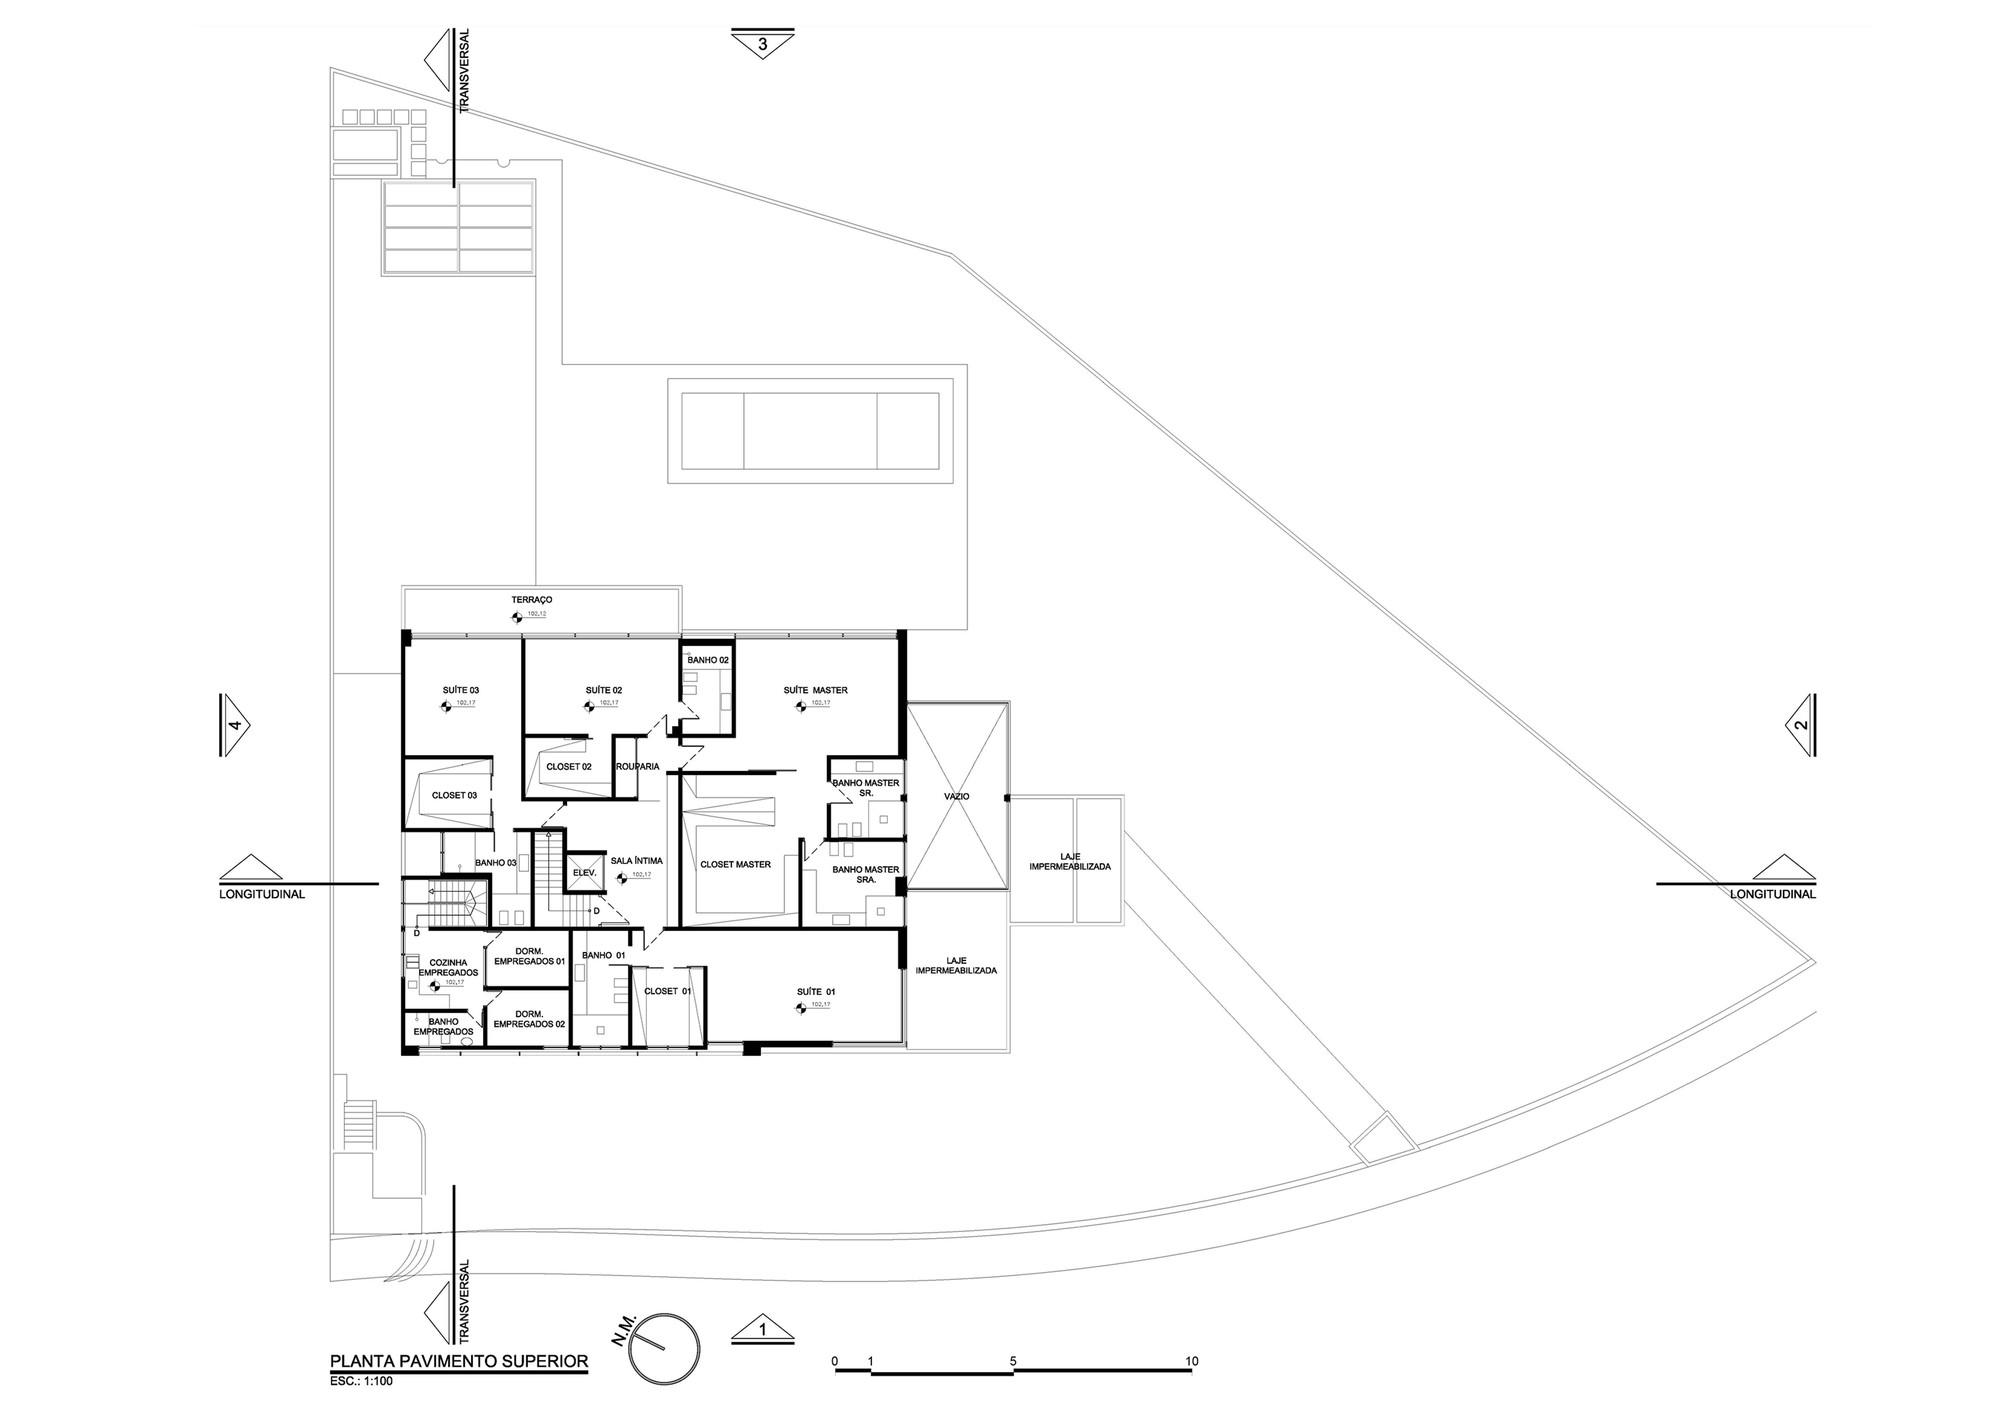 Morumbi Residence / Drucker Arquitetos Associados